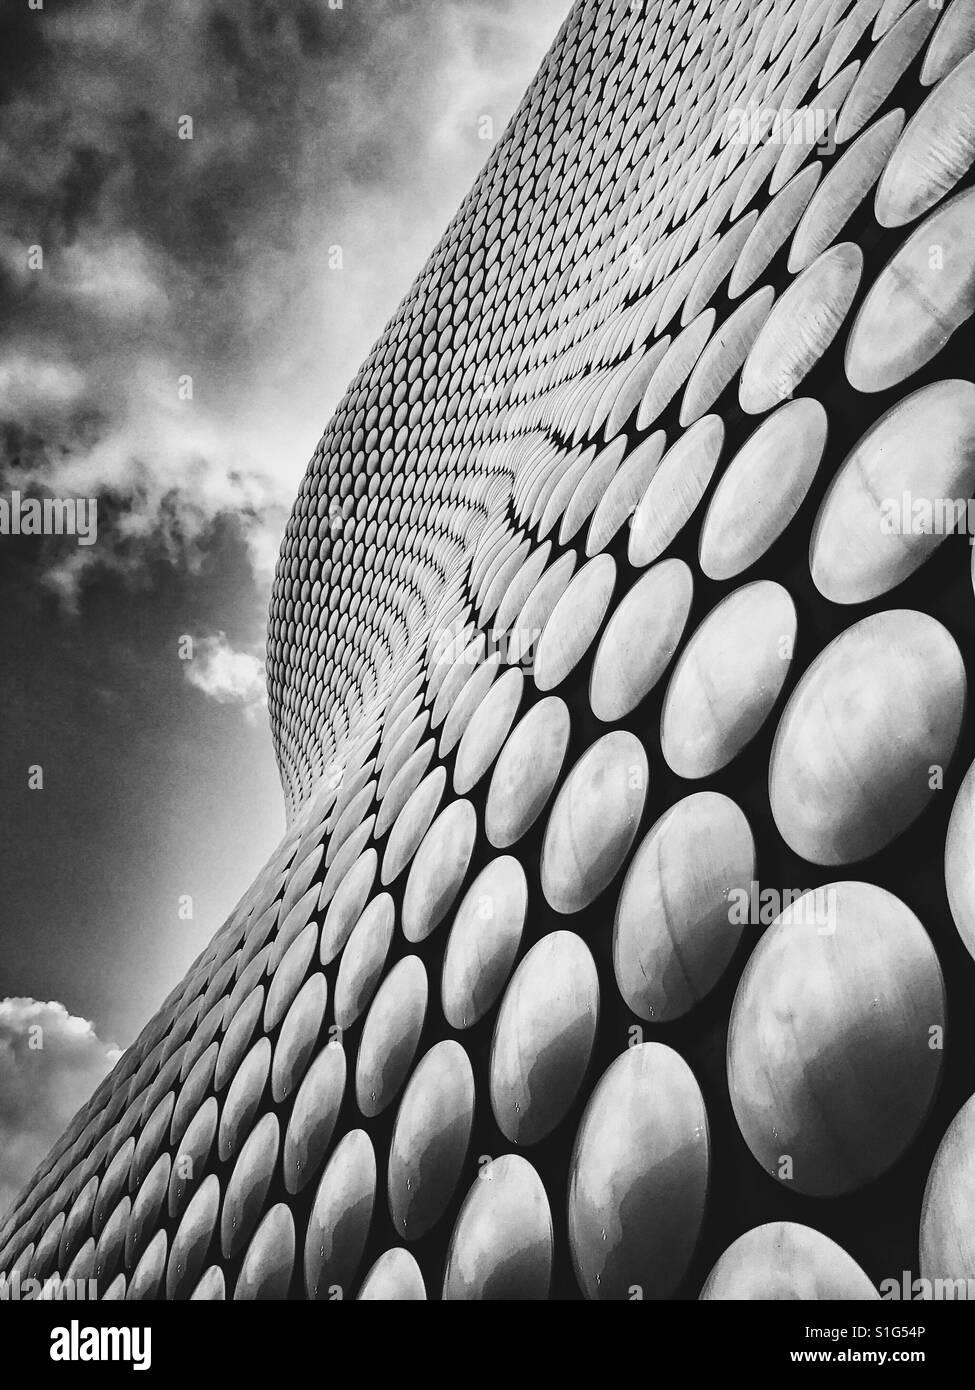 The Selfridges building, Birmingham - Stock Image